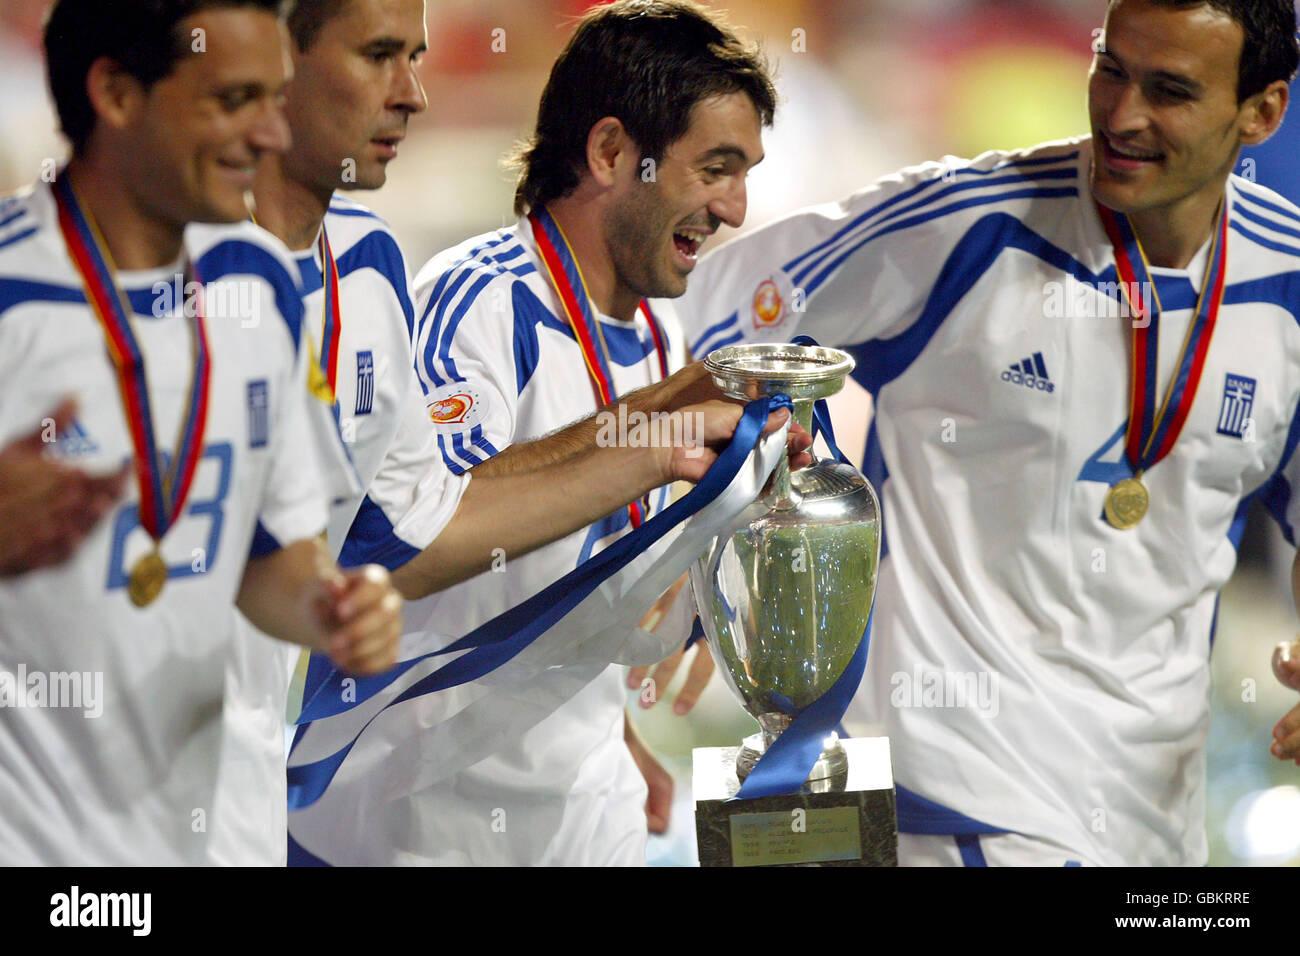 Soccer - UEFA European Championship 2004 - Final - Portugal v Greece Stock Photo